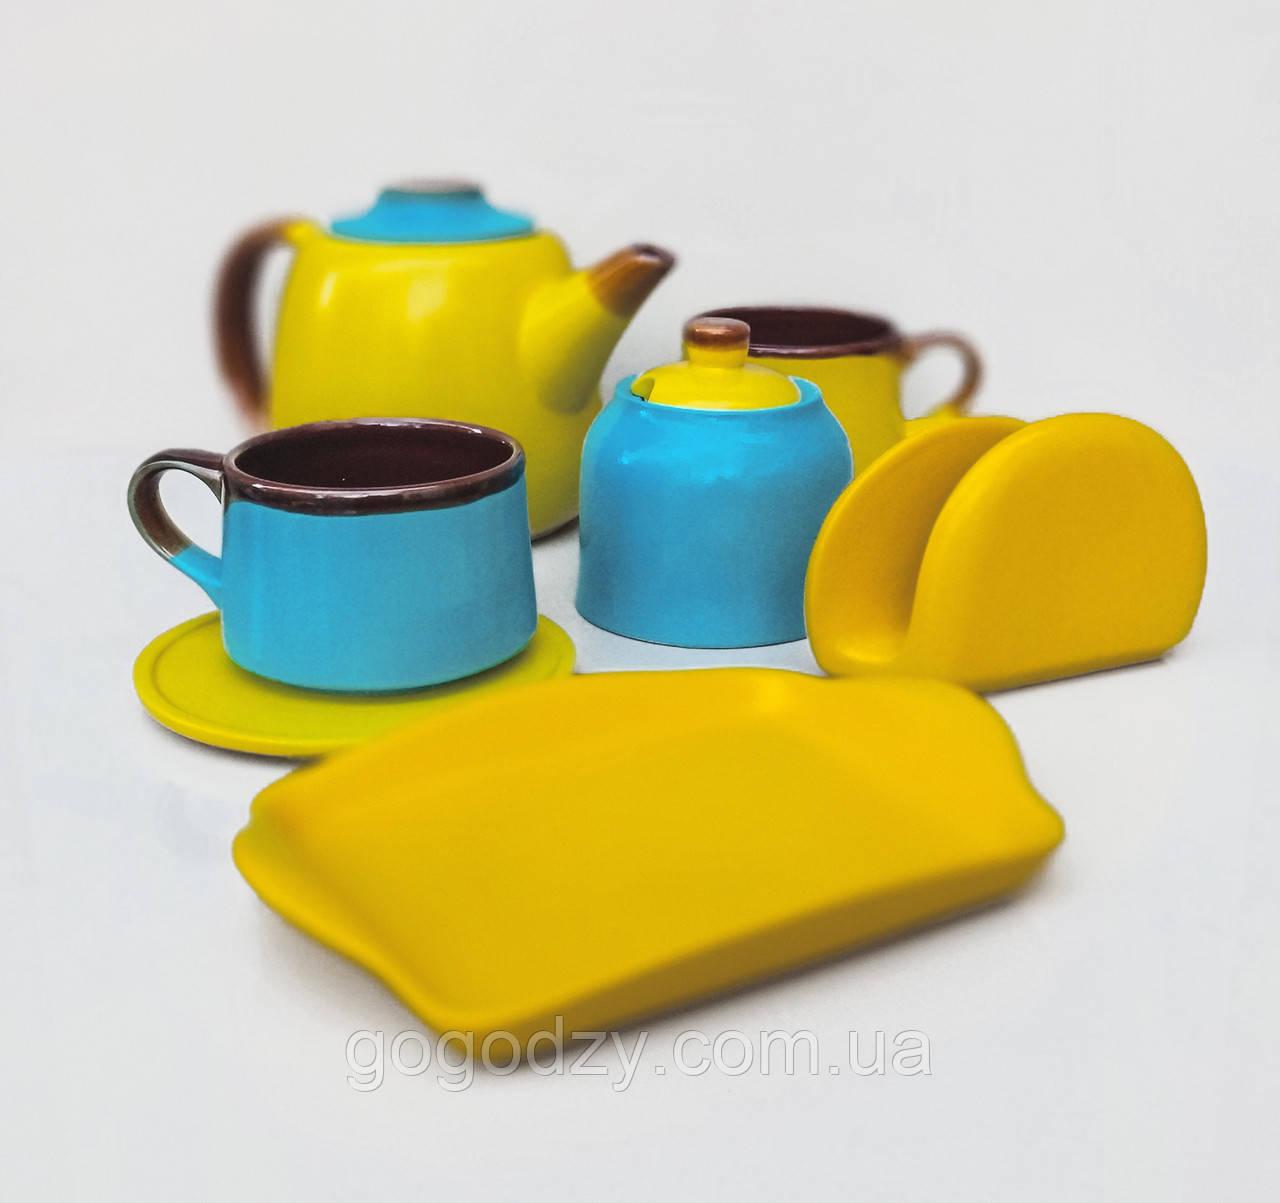 Чайний набір жовто-блакитний на 2 особи